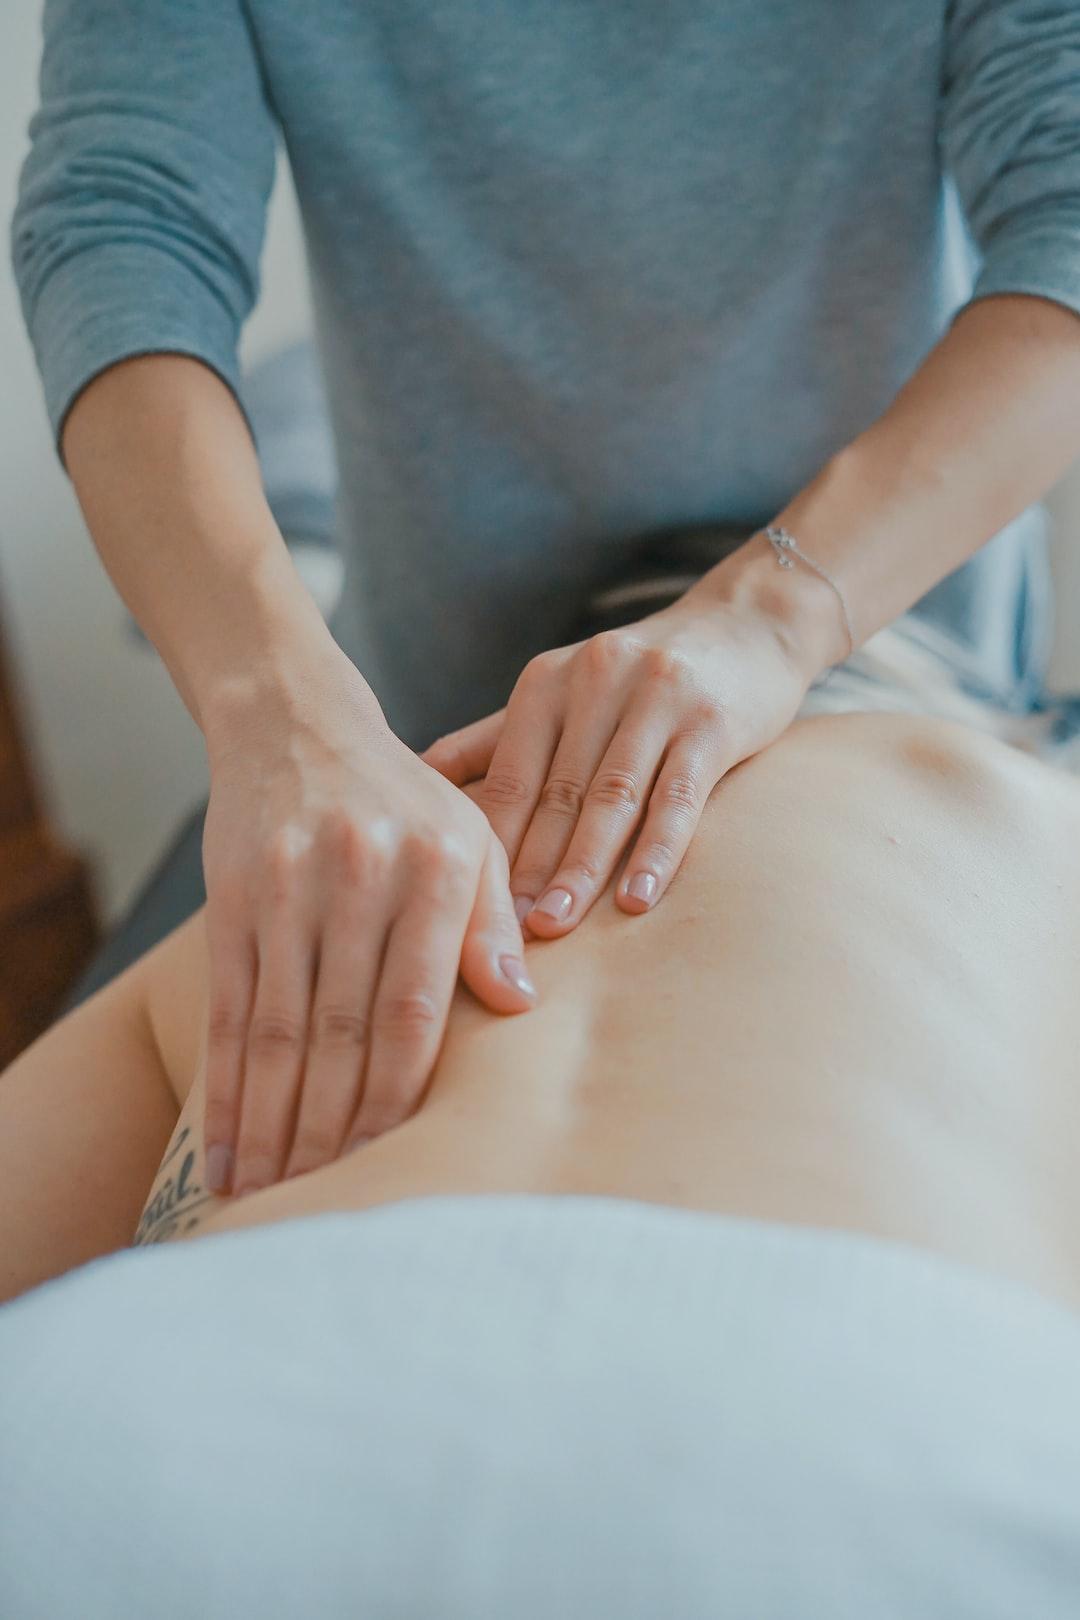 4 Health Benefits Of Chiropractic Care